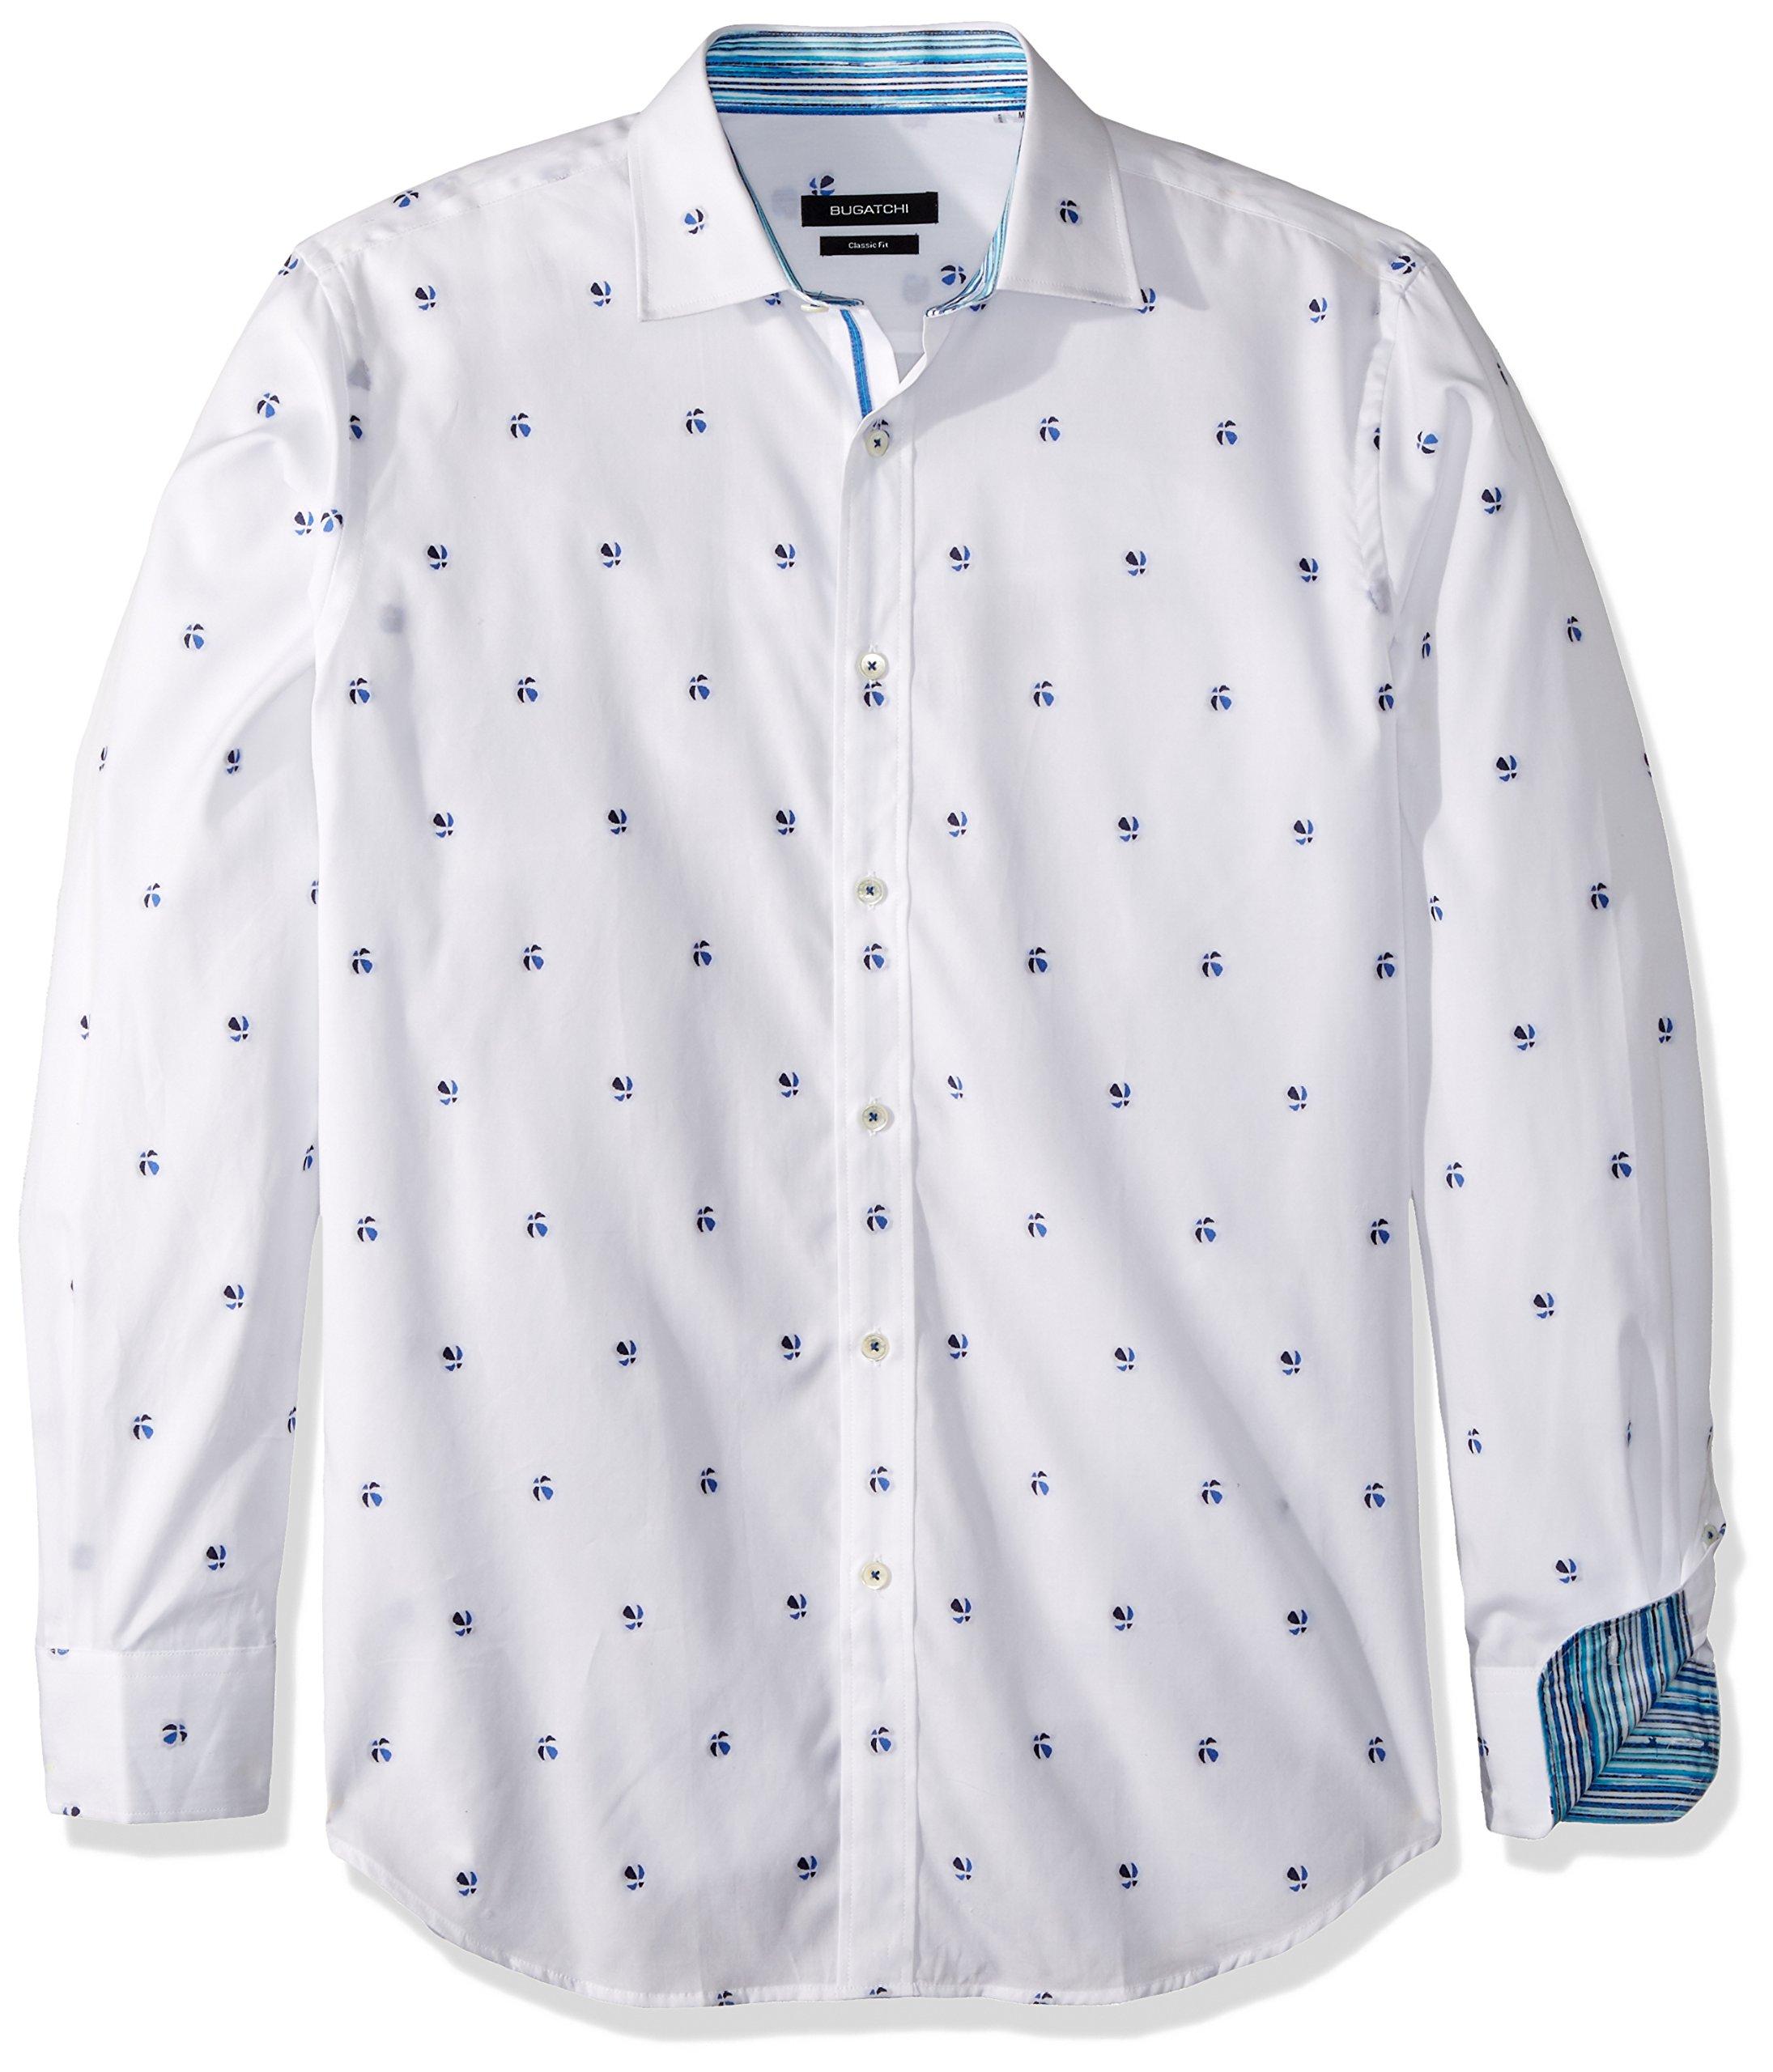 BUGATCHI Men's Cotton Classic Fit Long Sleeve Dayne Shirt, White, XL